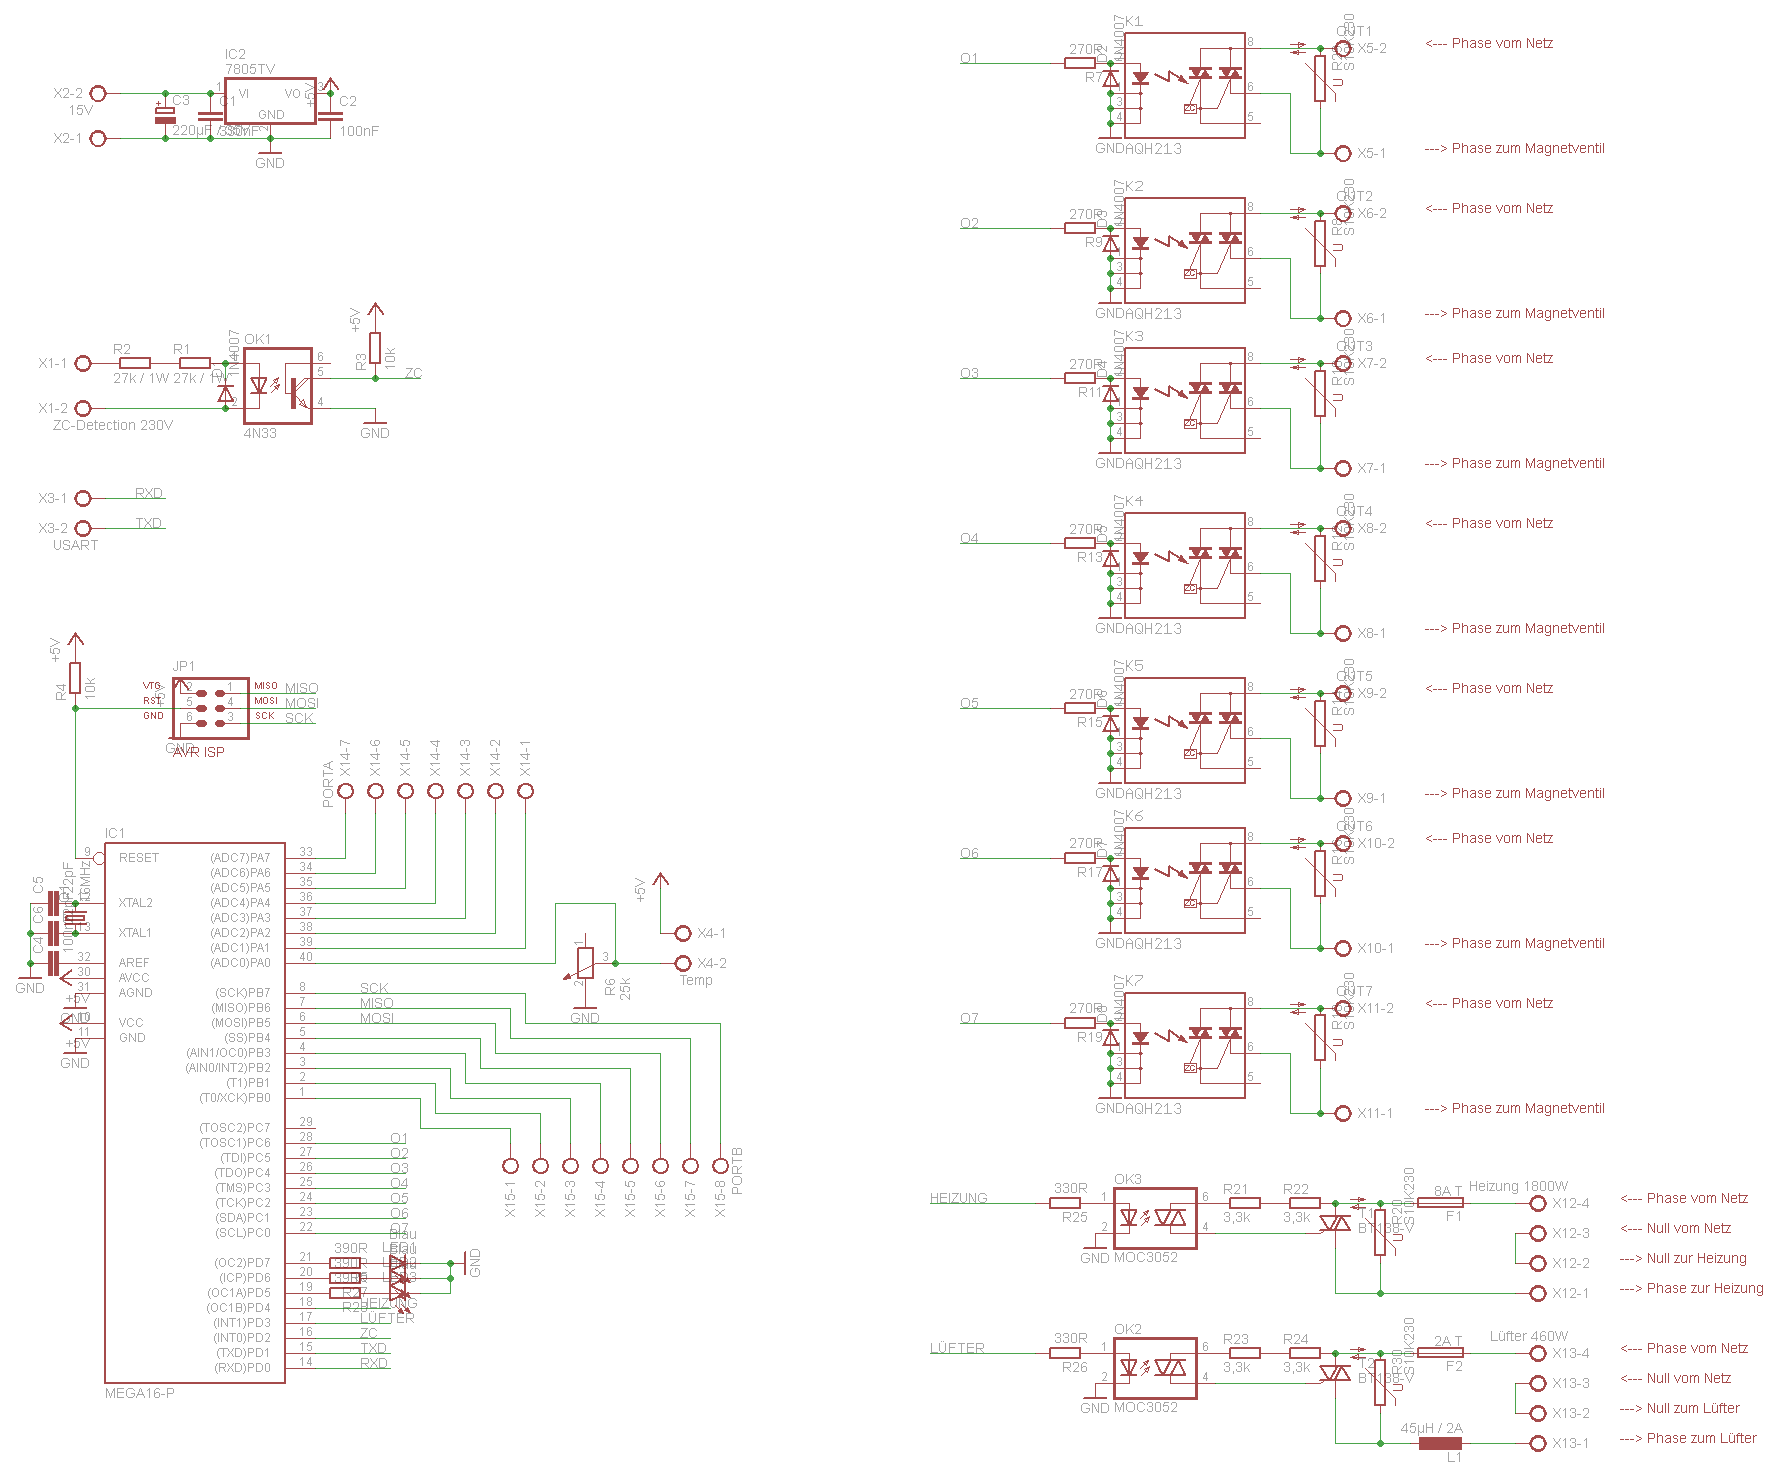 Mikrocontroller steuert SSR und Triacs - Mikrocontroller.net